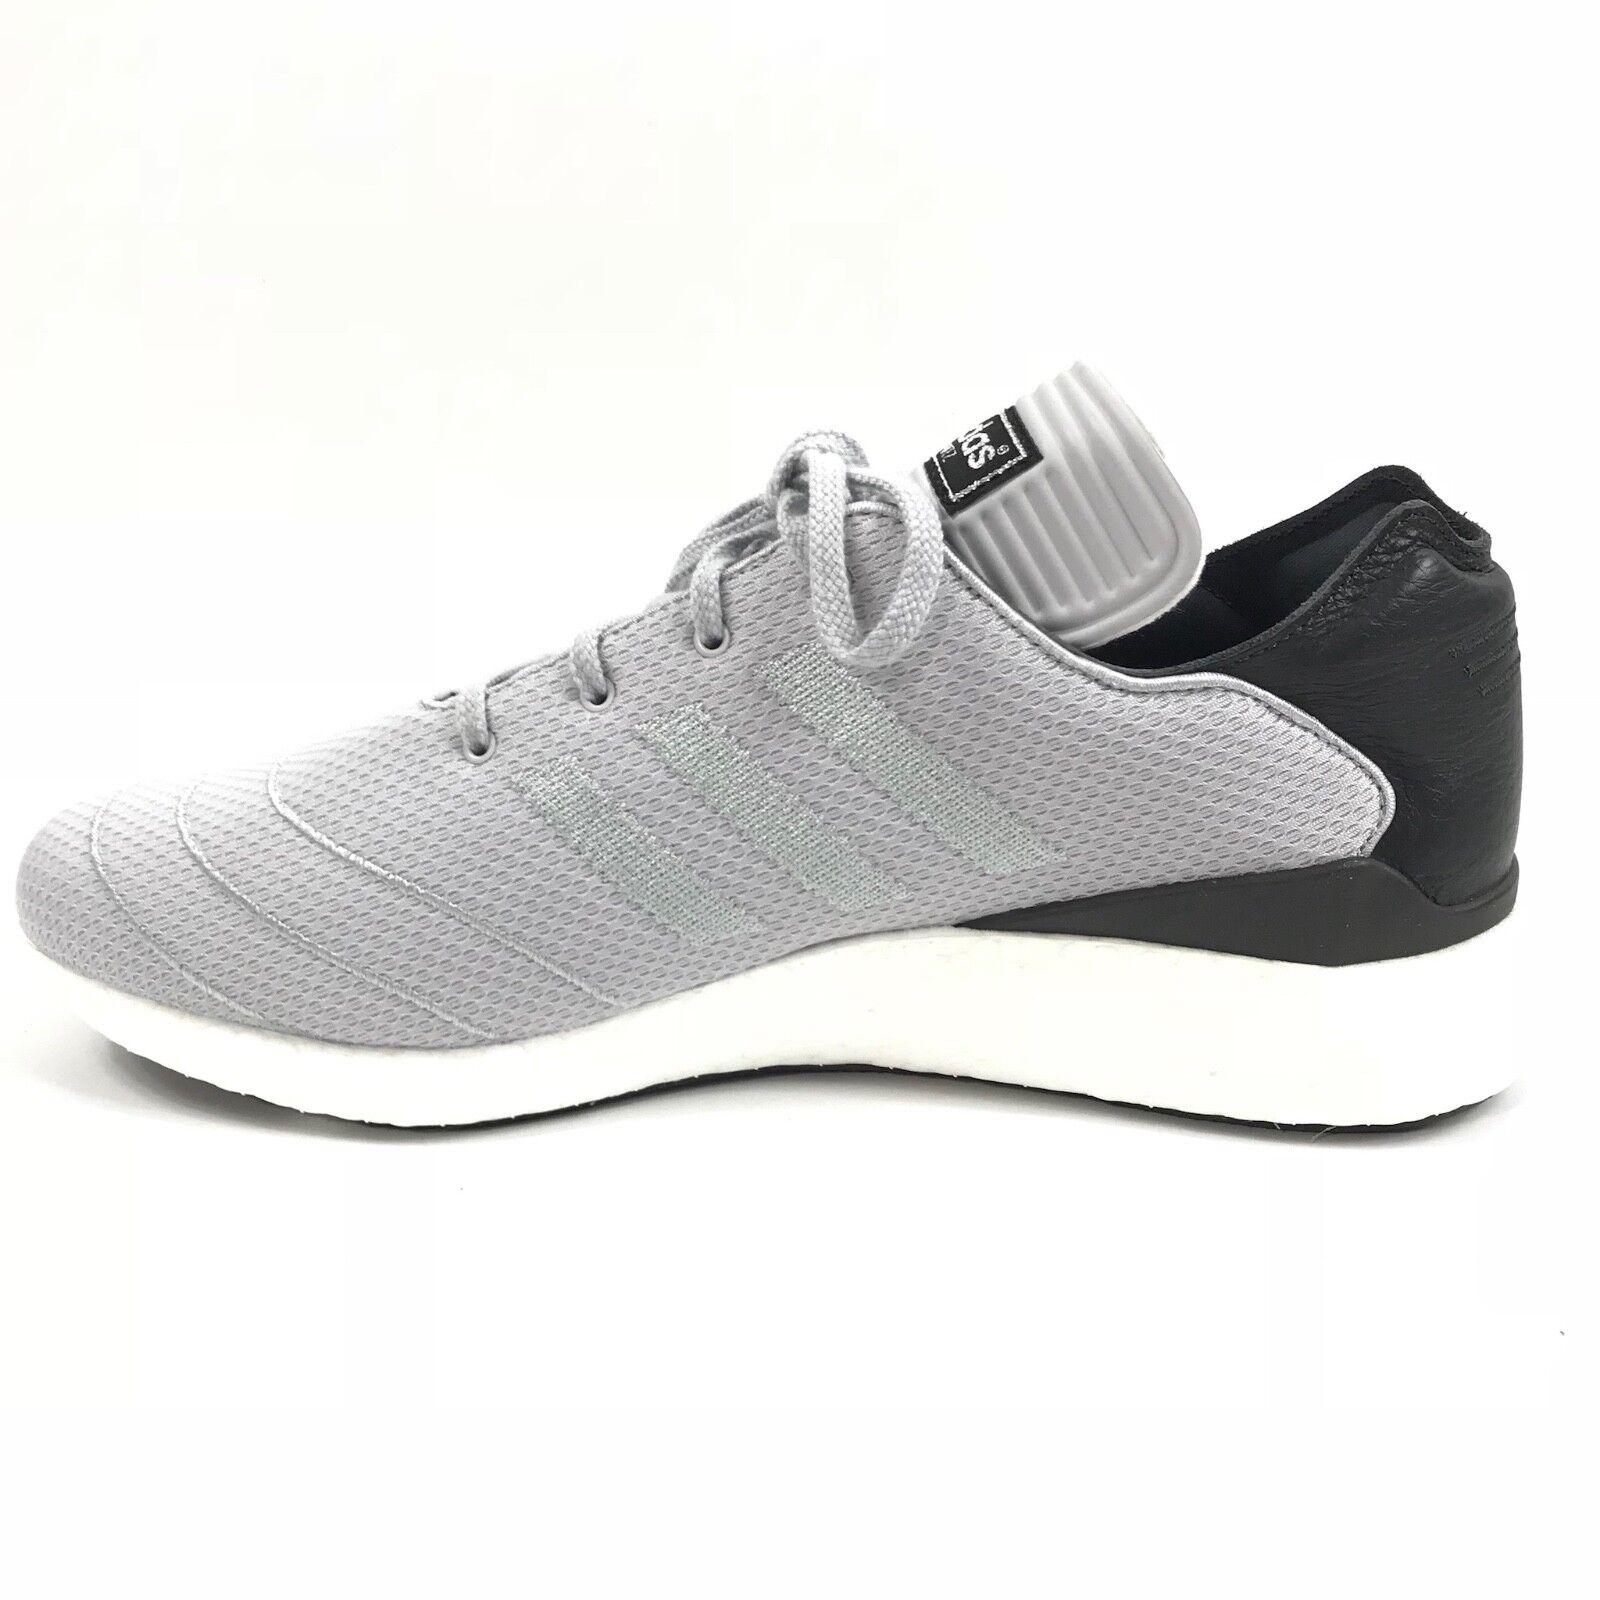 d0da533802f2 Adidas Mens Busenitz Pure Boost Primeknit Primeknit Primeknit Gray Black  White F37782 Ultra Sz 11.5 e9a5e4